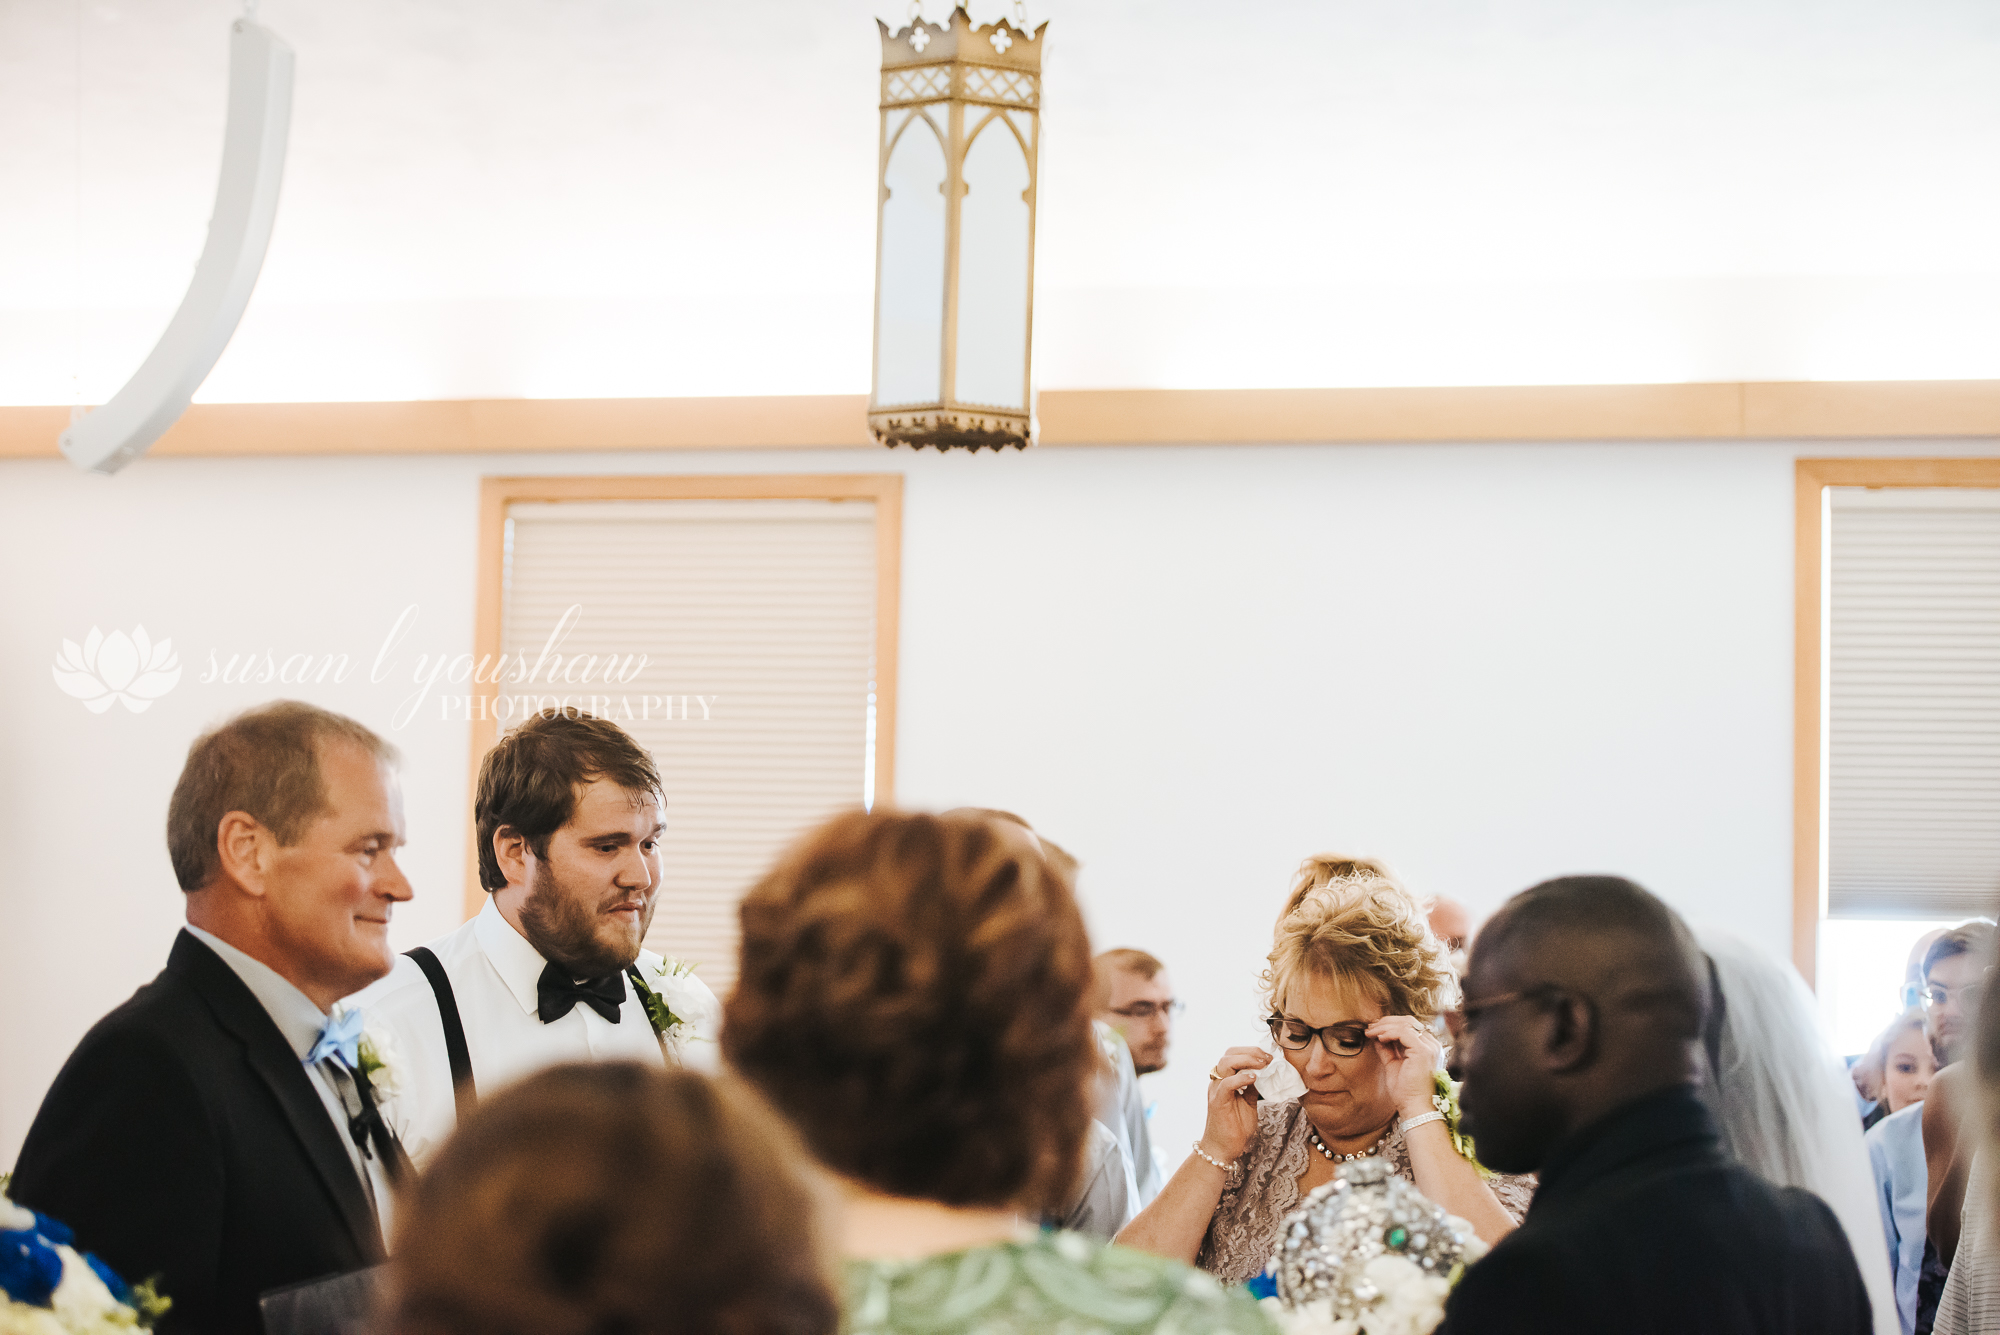 Katelyn and Wes Wedding Photos 07-13-2019 SLY Photography-57.jpg